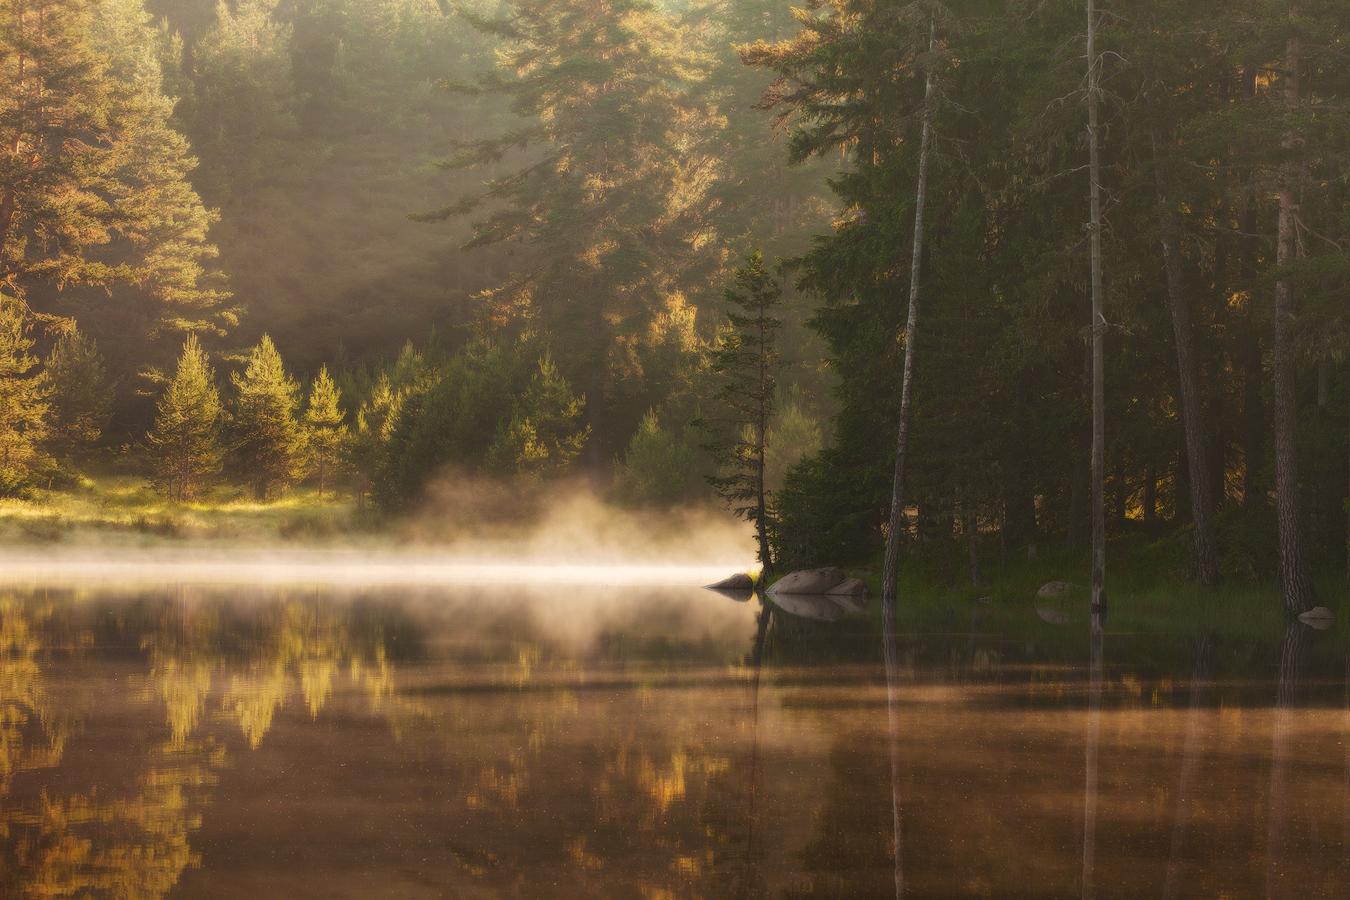 Photo in Landscape | Author Svetlozar Asparuhov - exobexo | PHOTO FORUM